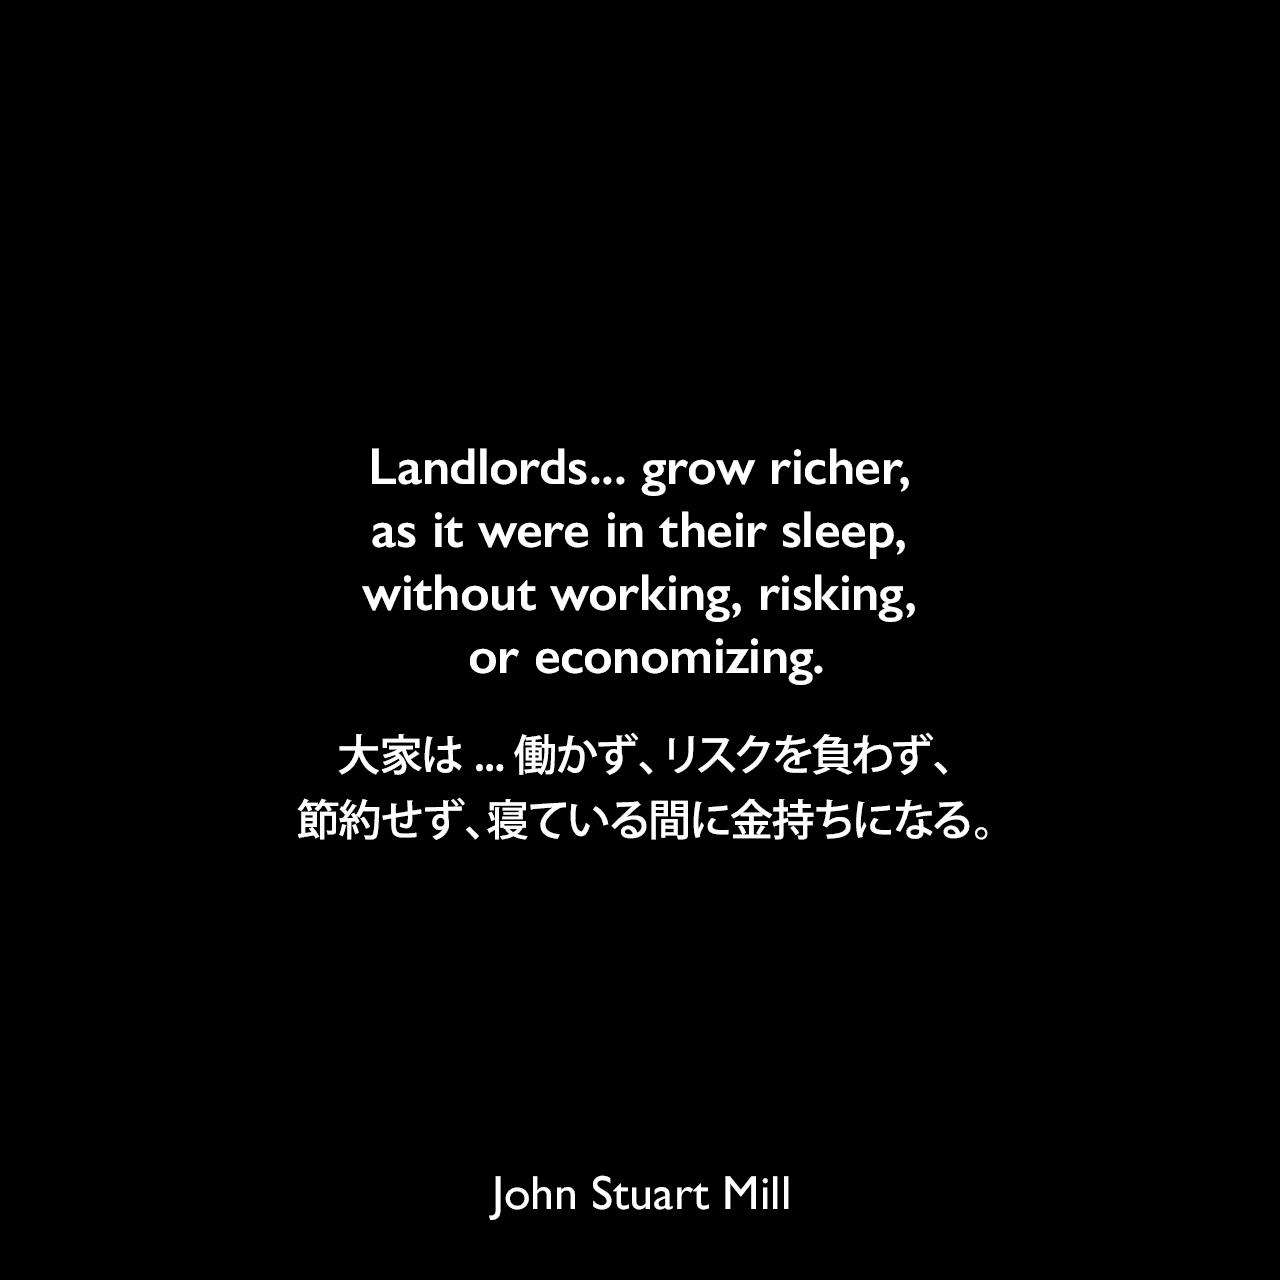 Landlords... grow richer, as it were in their sleep, without working, risking, or economizing.大家は...働かず、リスクを負わず、節約せず、寝ている間に金持ちになる。- ジョン・スチュアート・ミルによる本「Principles of Political Economy」よりJohn Stuart Mill